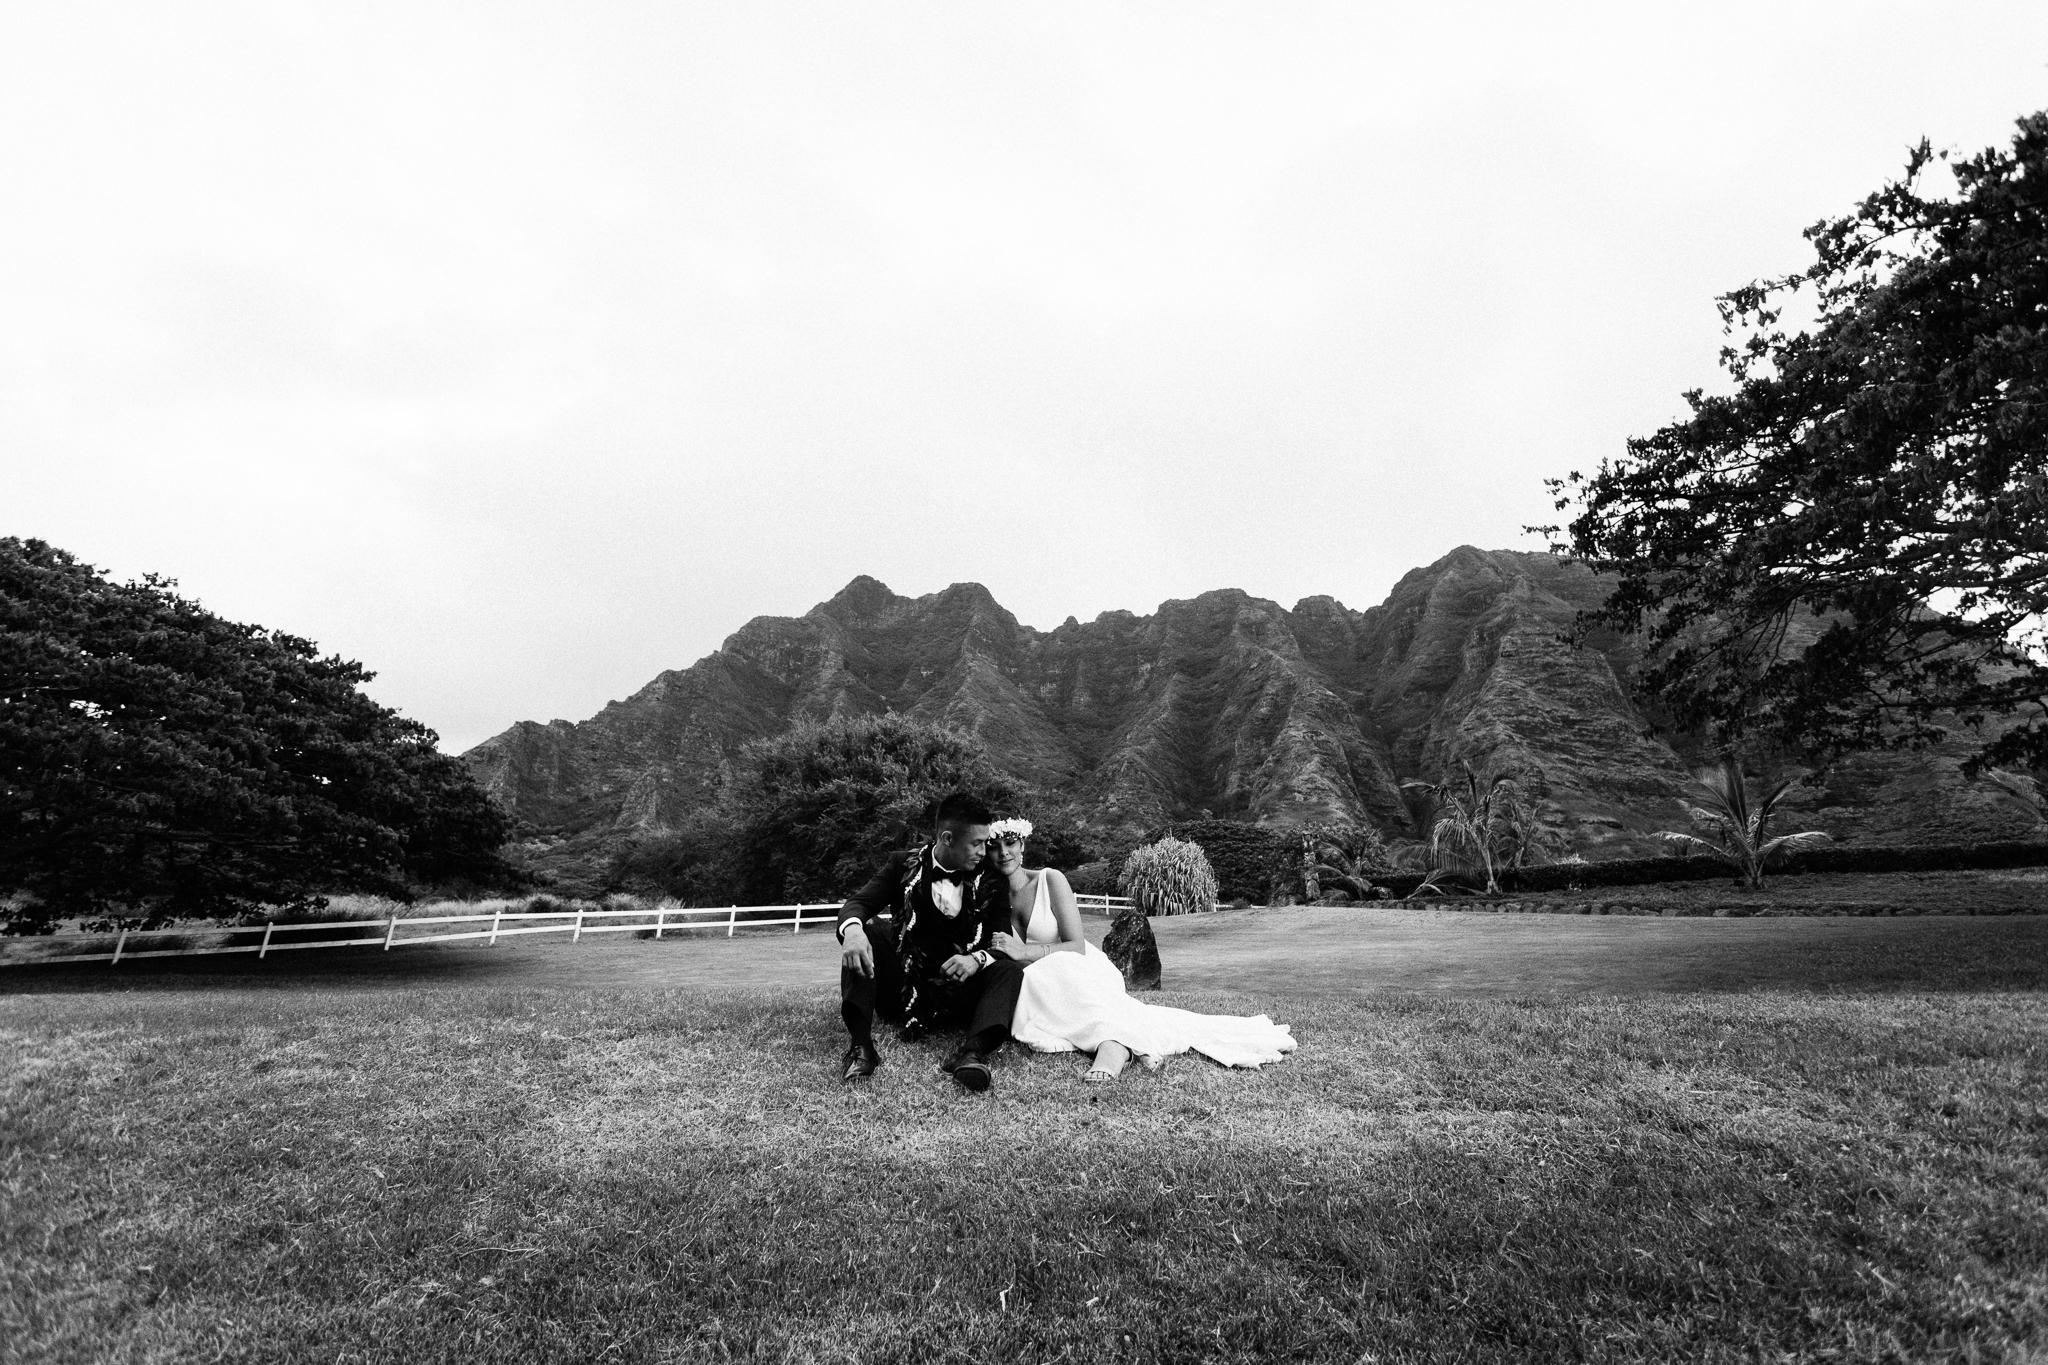 Kualoa_Ranch_Wedding_Photographer_Tone_Hawaii-34.jpg